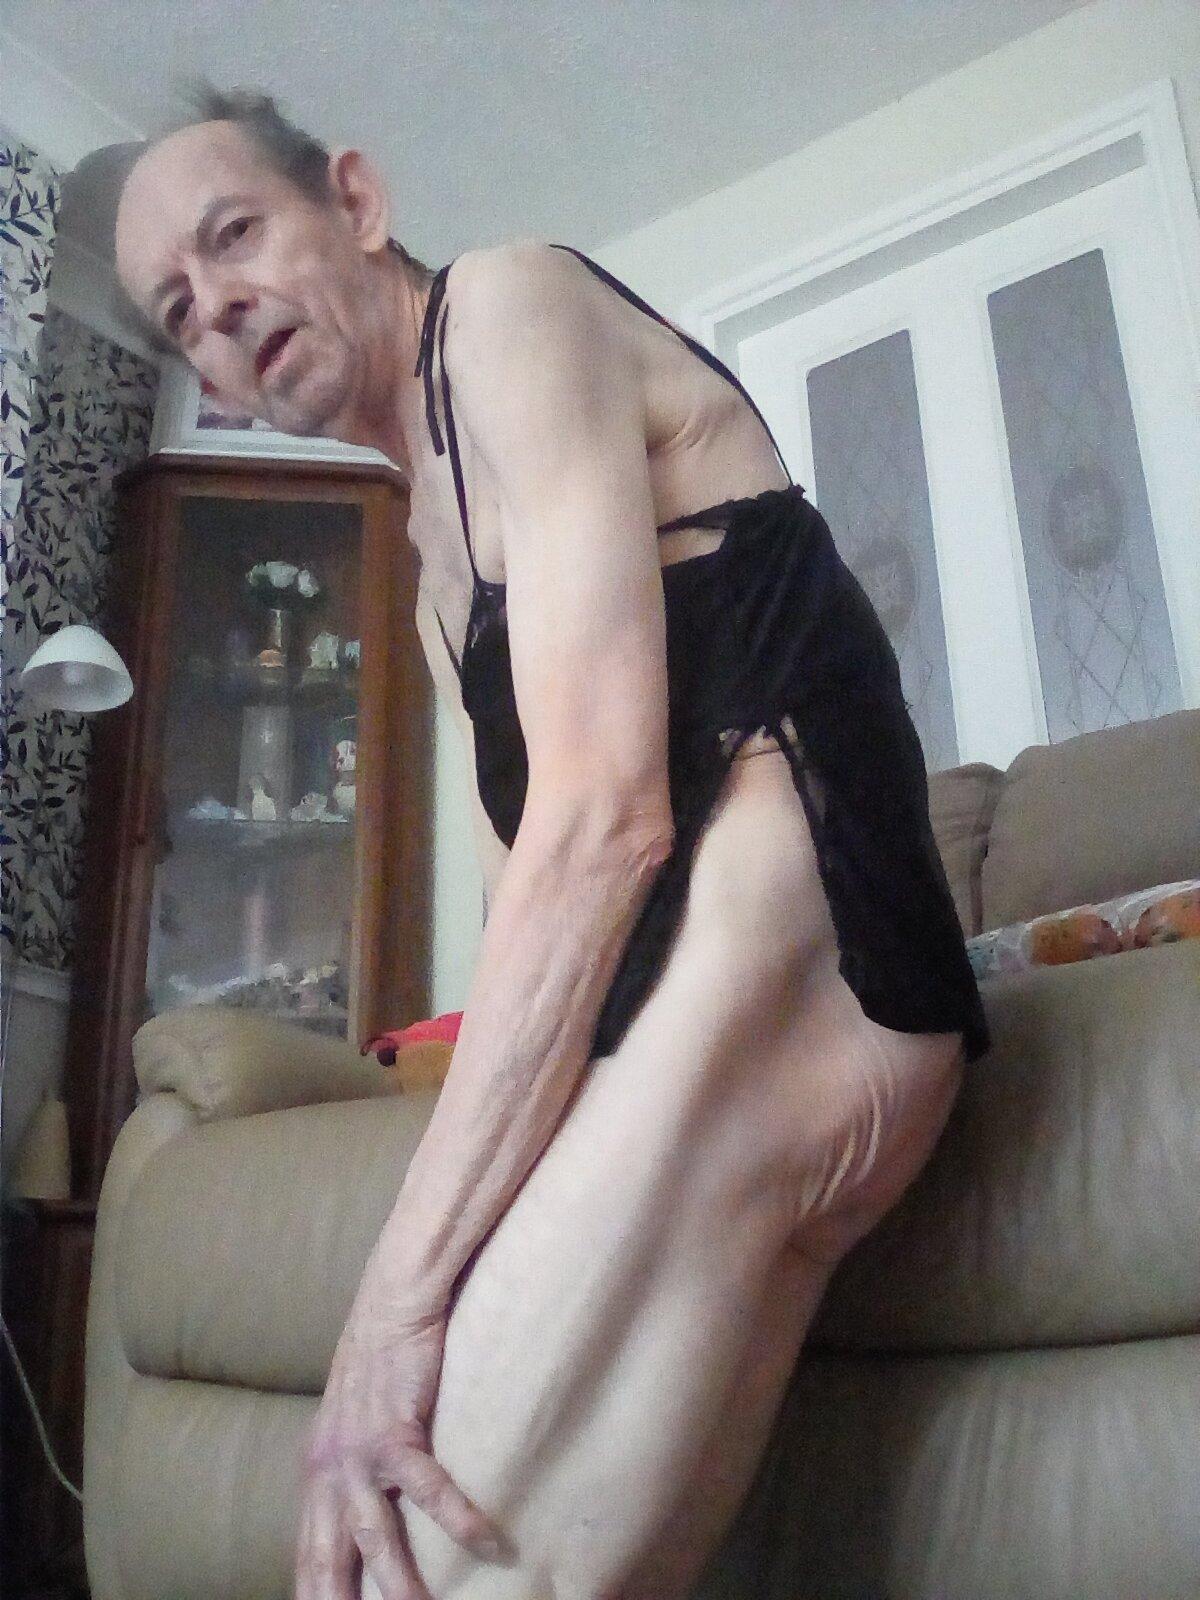 John69 from Milton Keynes,United Kingdom